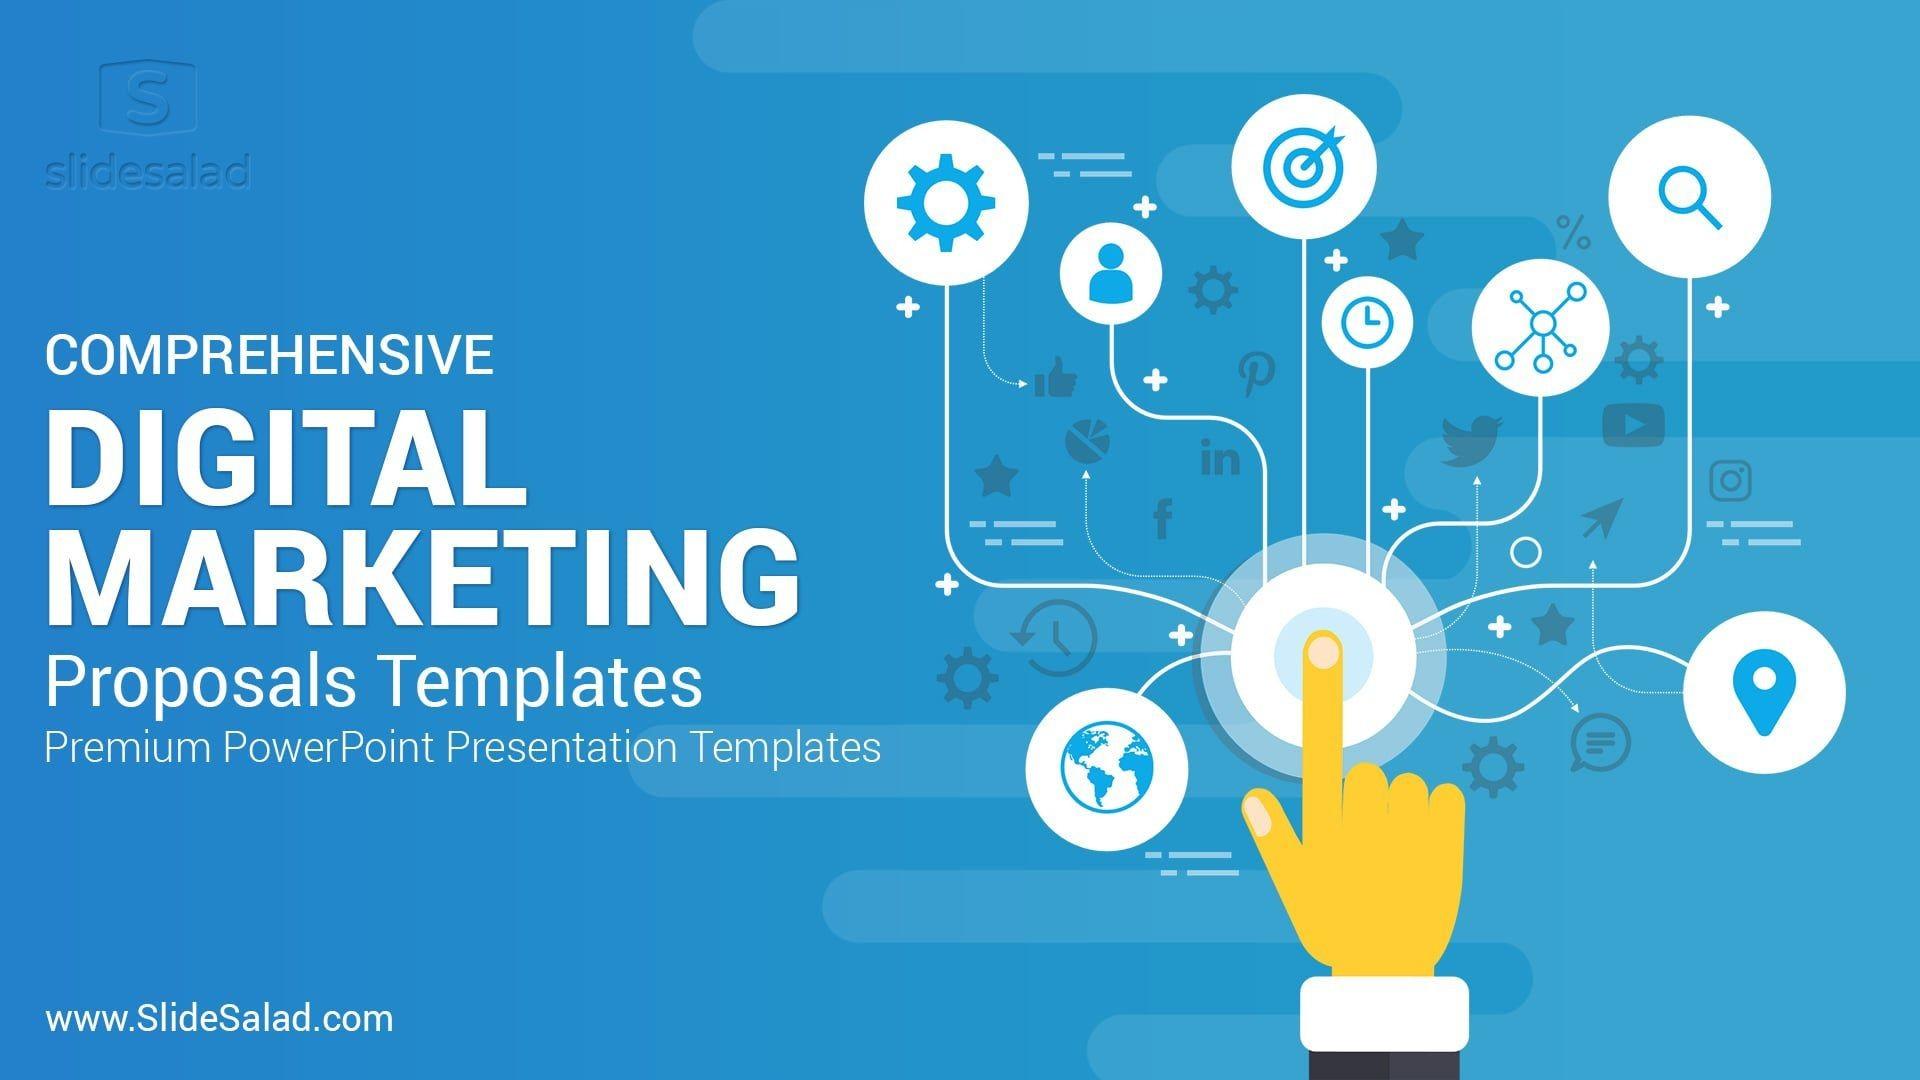 005 Wondrou Free Digital Marketing Plan Template Ppt Design 1920